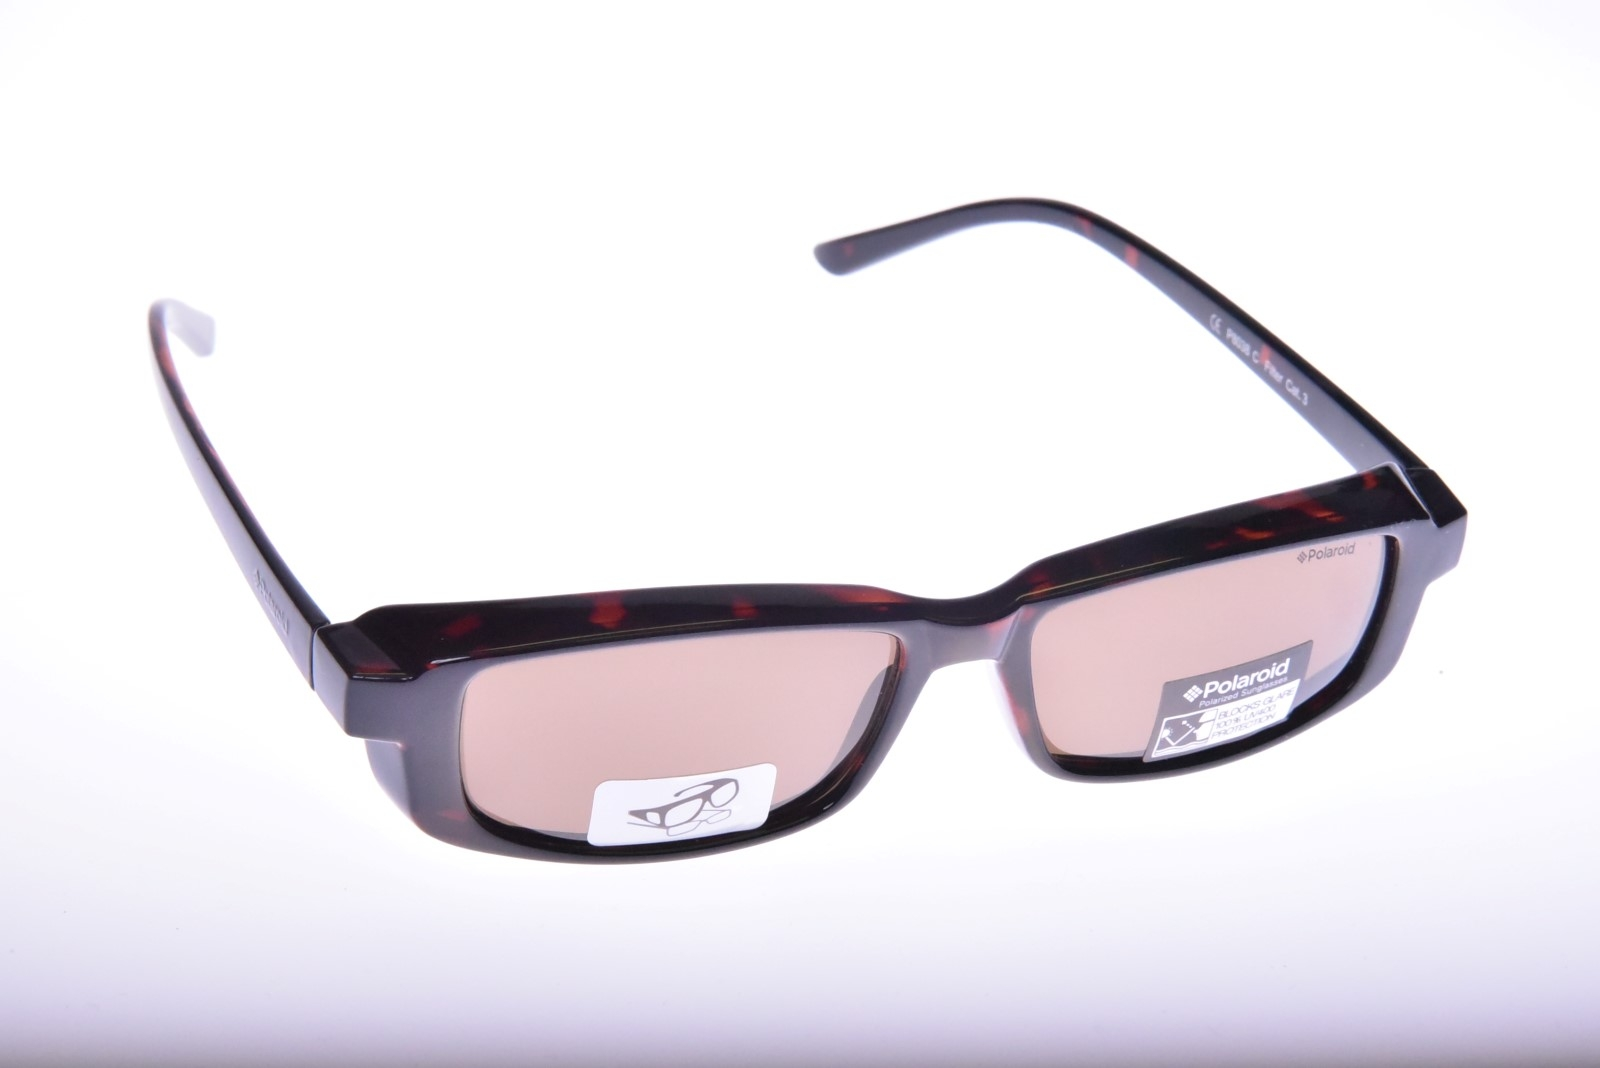 Polaroid Suncovers P8038C - Unisex slnečné okuliare